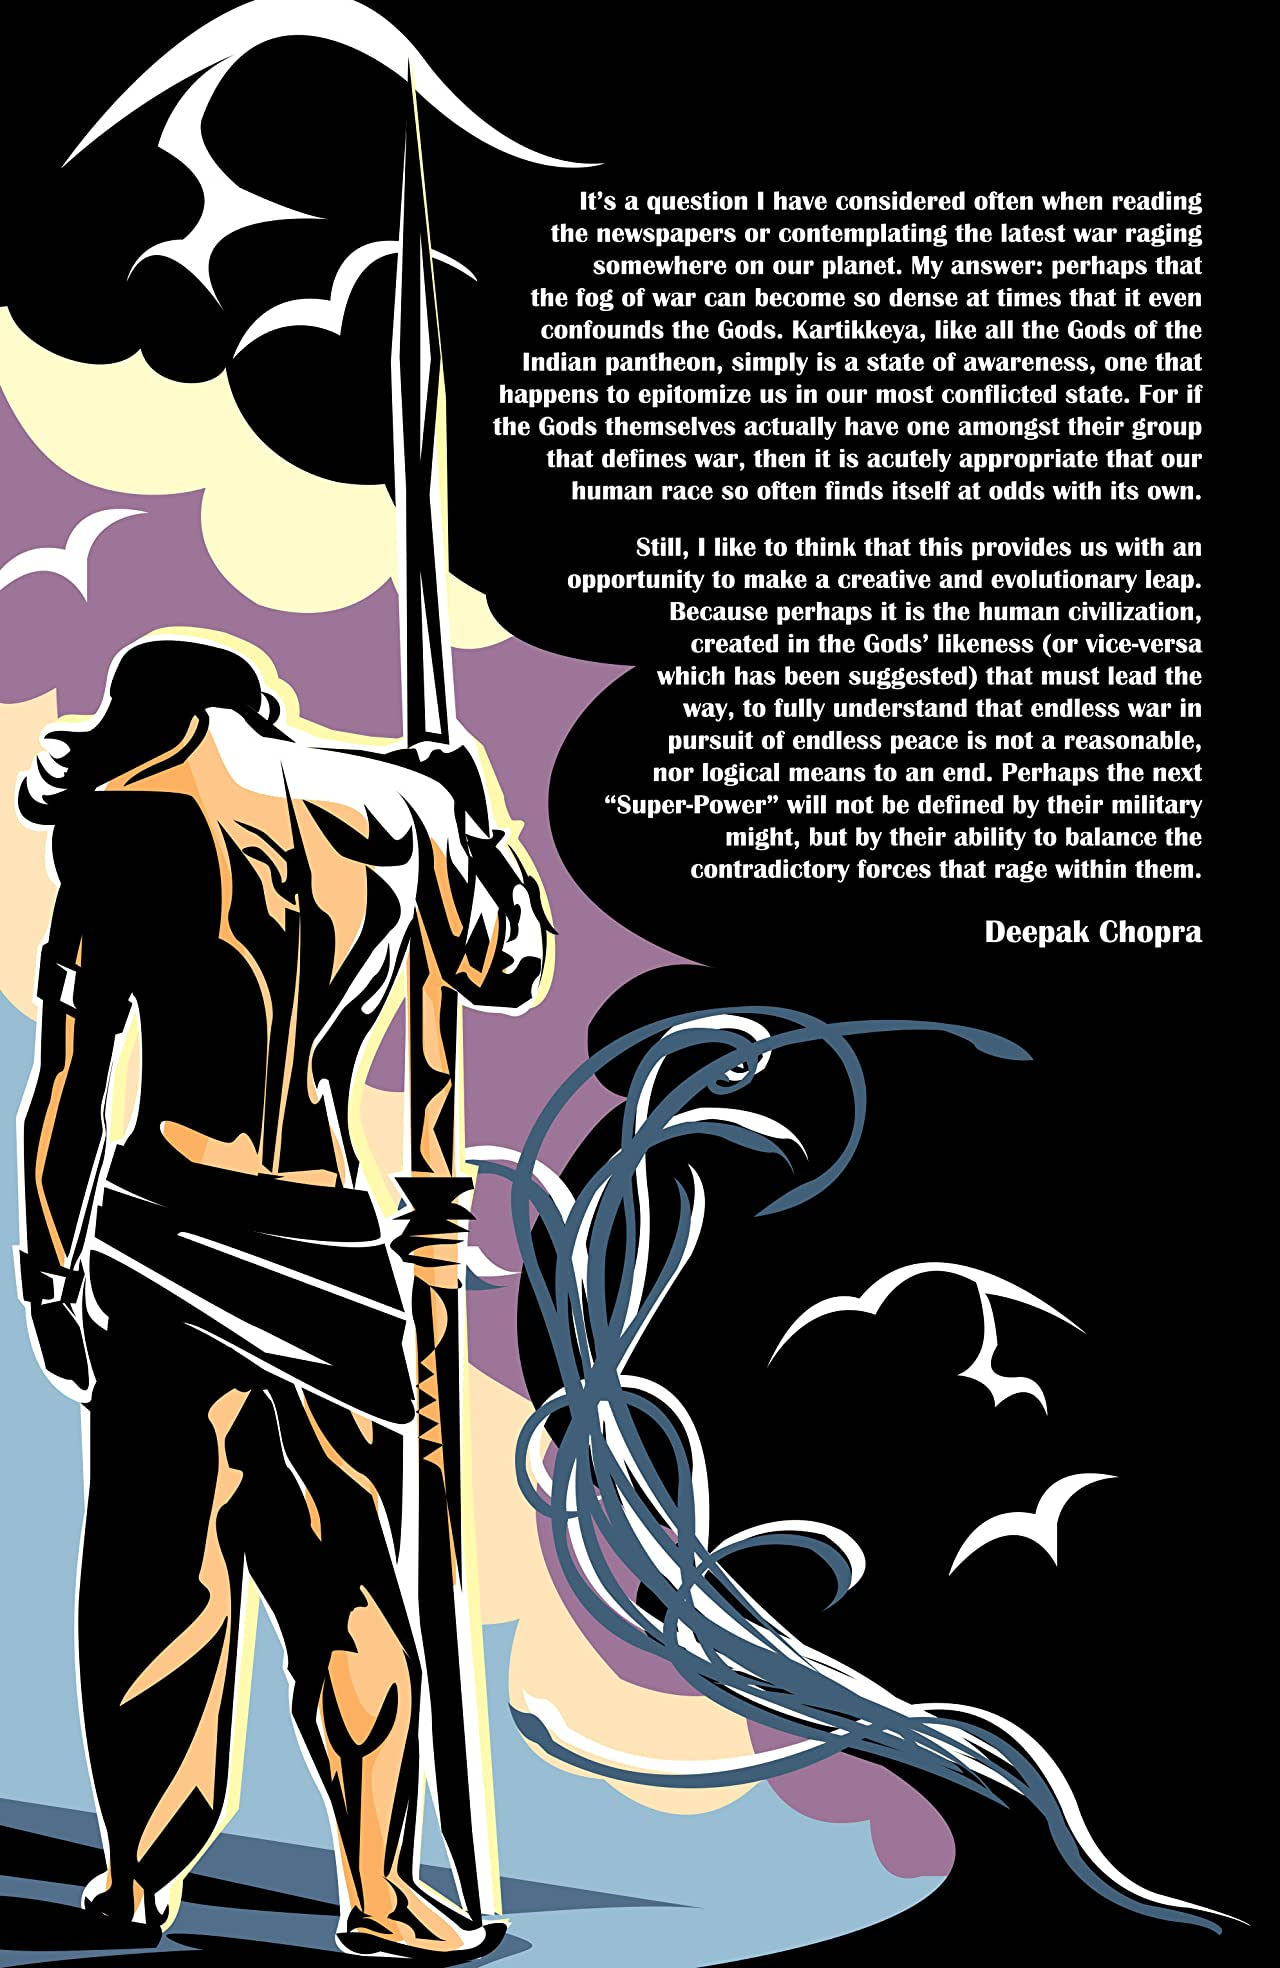 Myths of India: Karthikeya